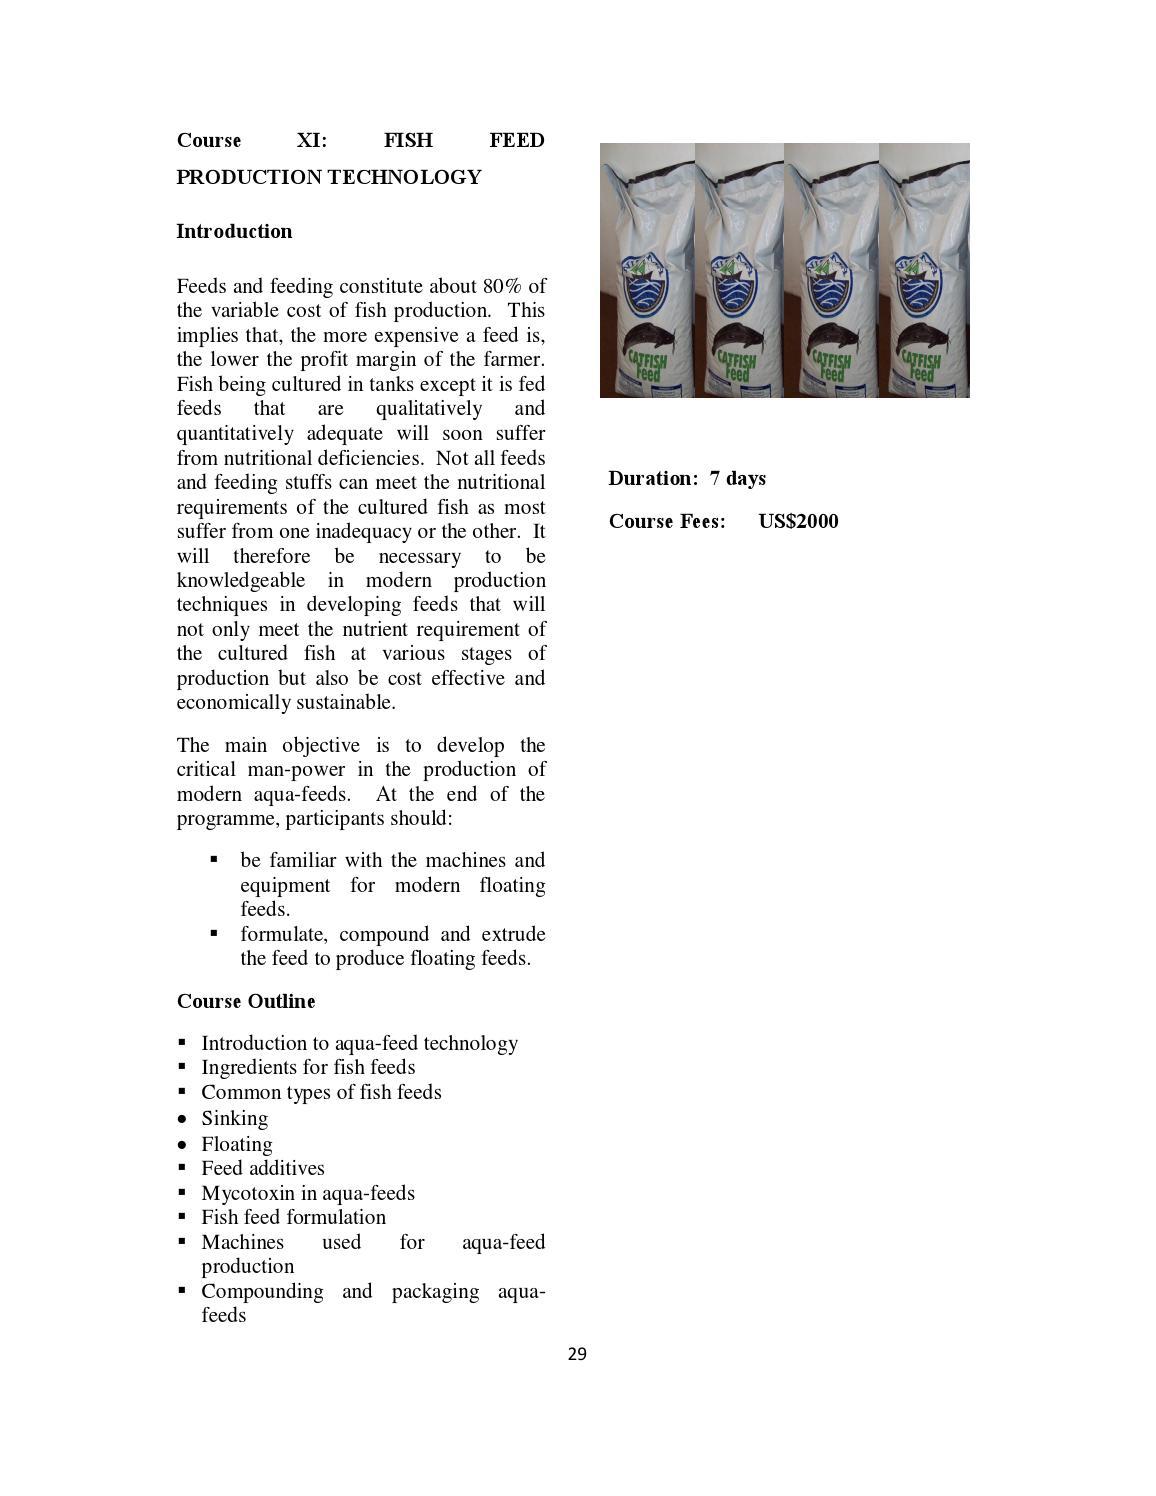 TRAINING BROCHURE ON AQUACULTURE PRODUCTION by CORAF/WECARD